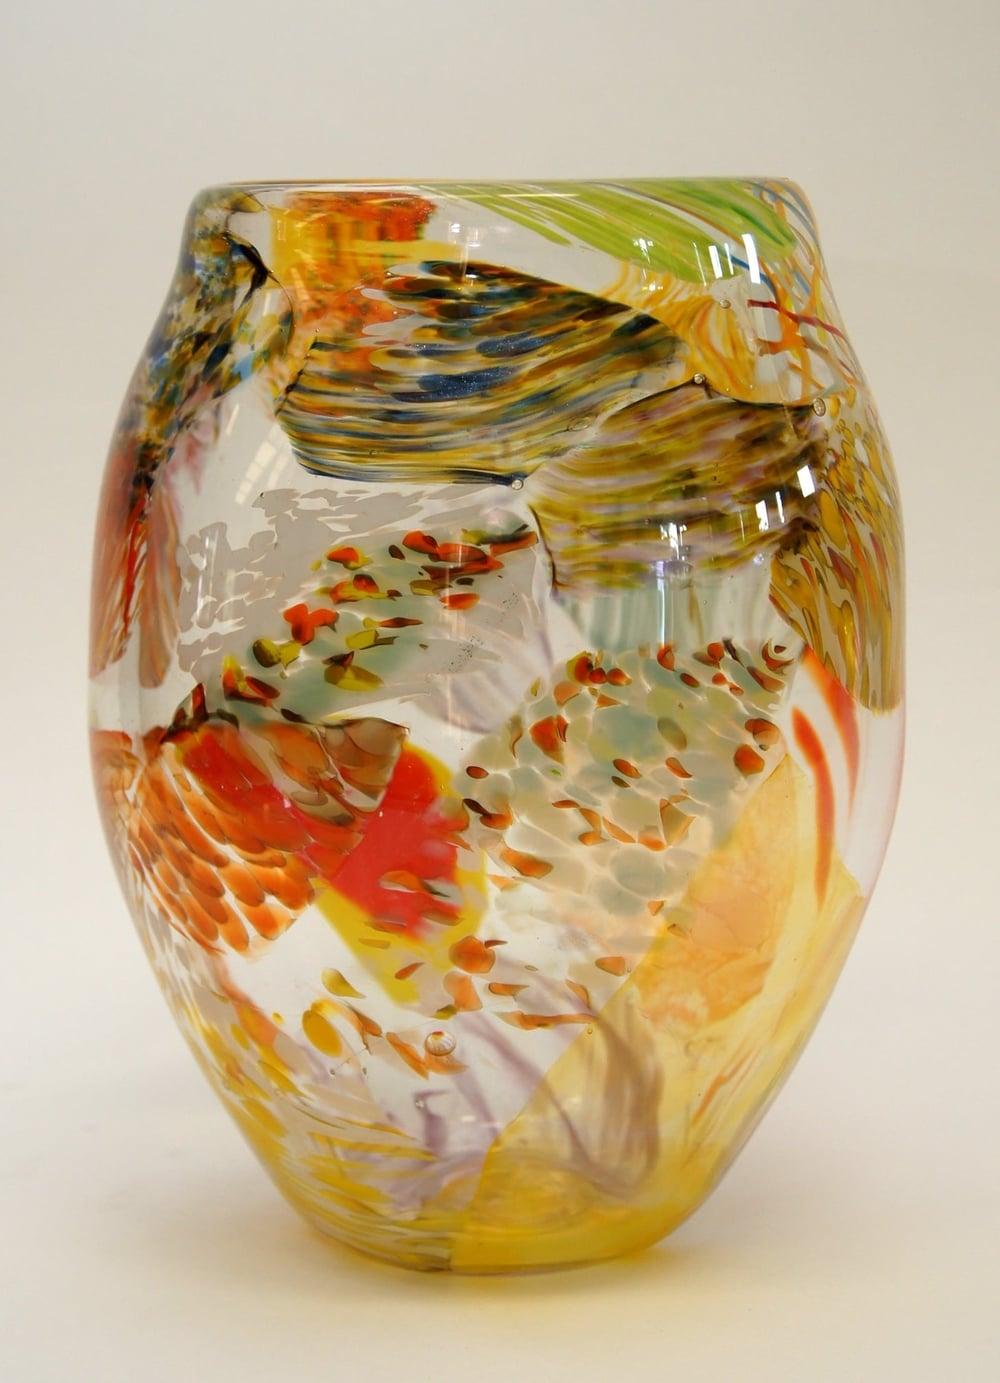 baker cullet vase 9.15.jpg